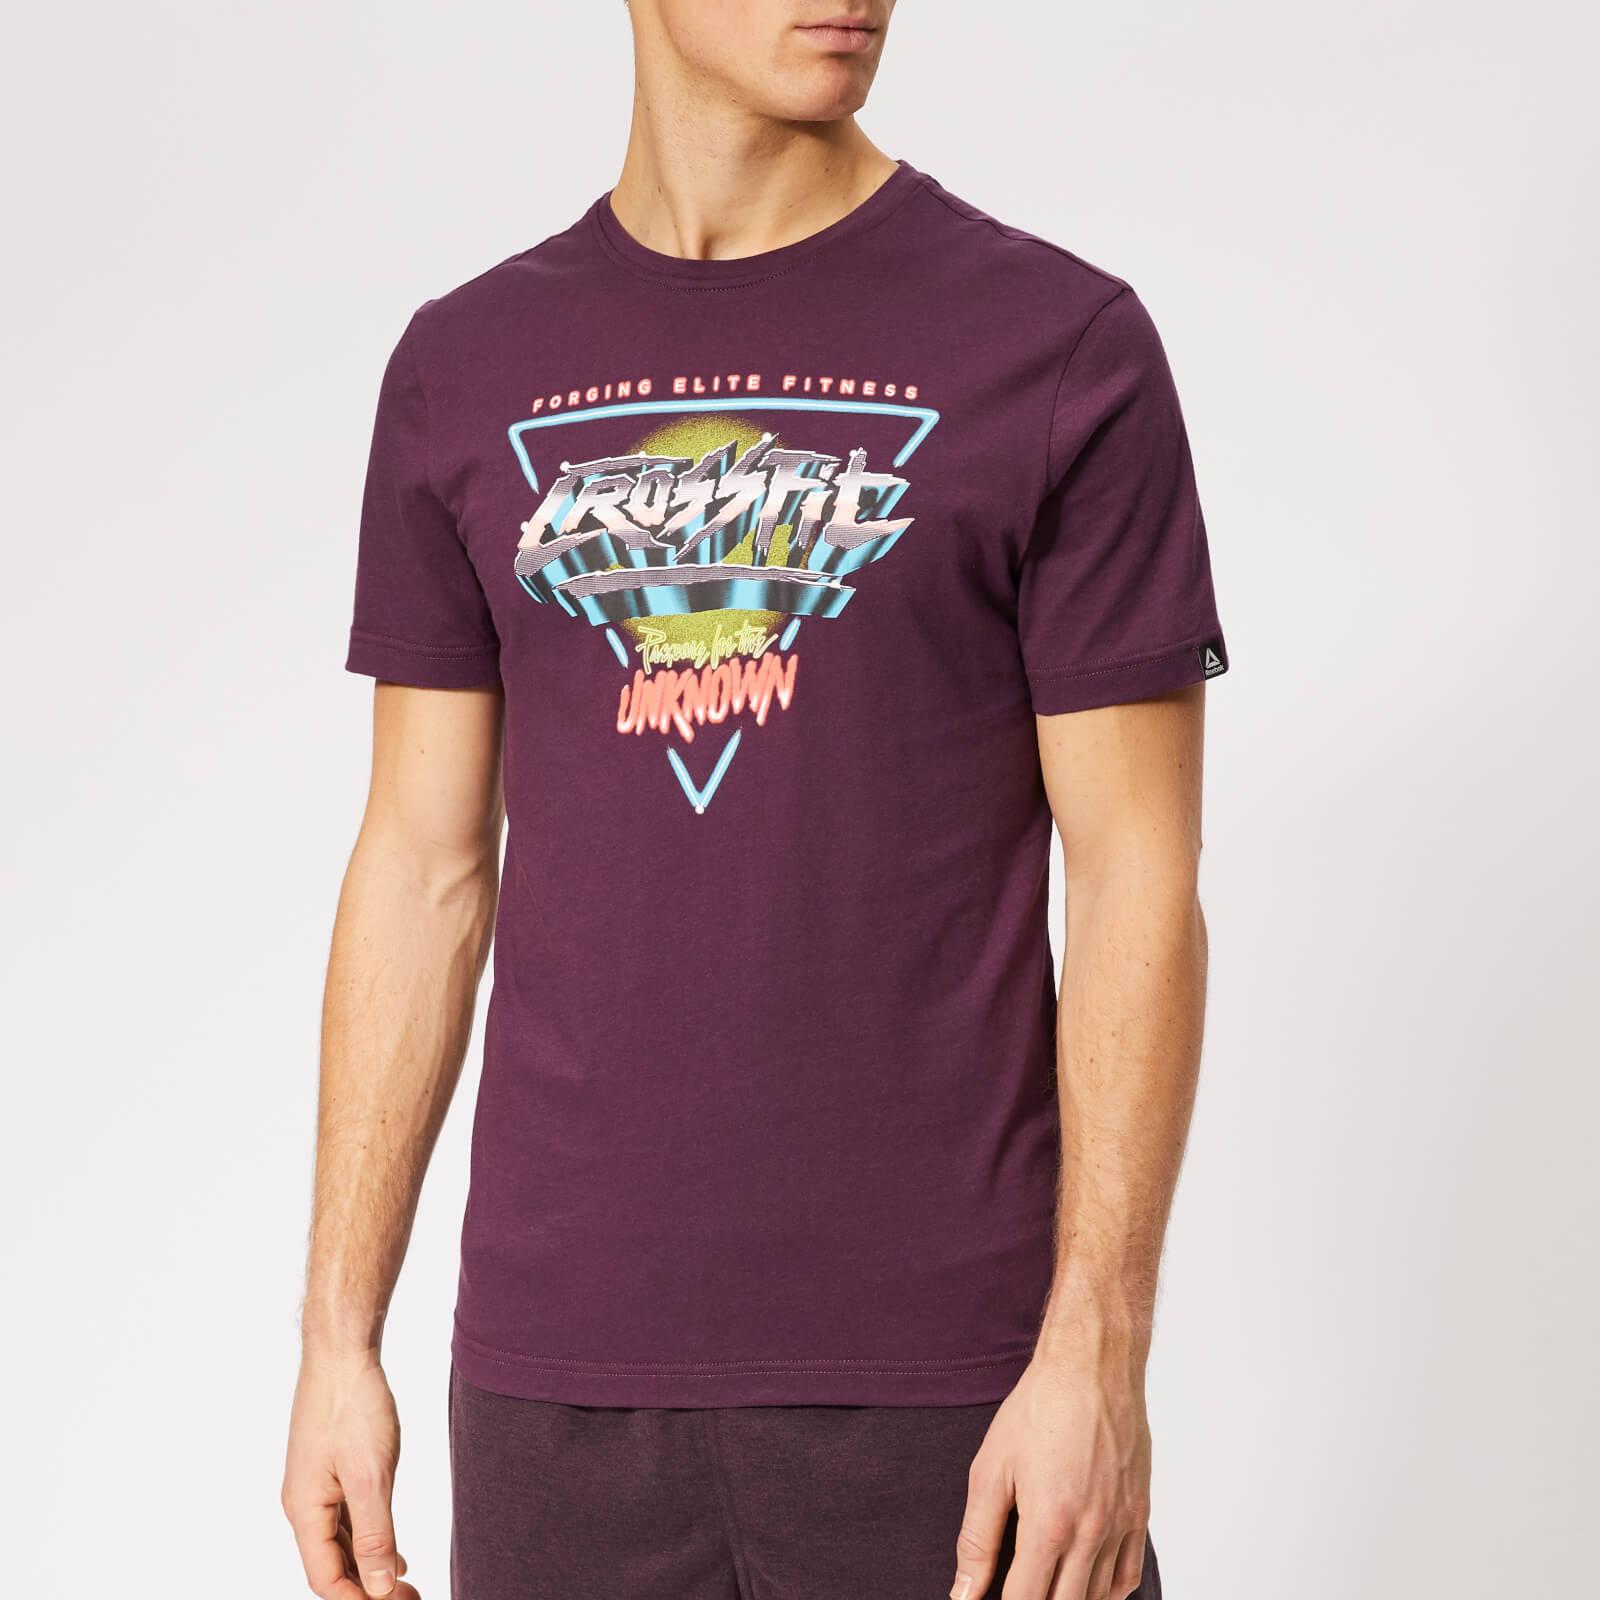 Reebok Men's Crossfit Neon Retro Short Sleeve T-Shirt - Purple - S - Purple